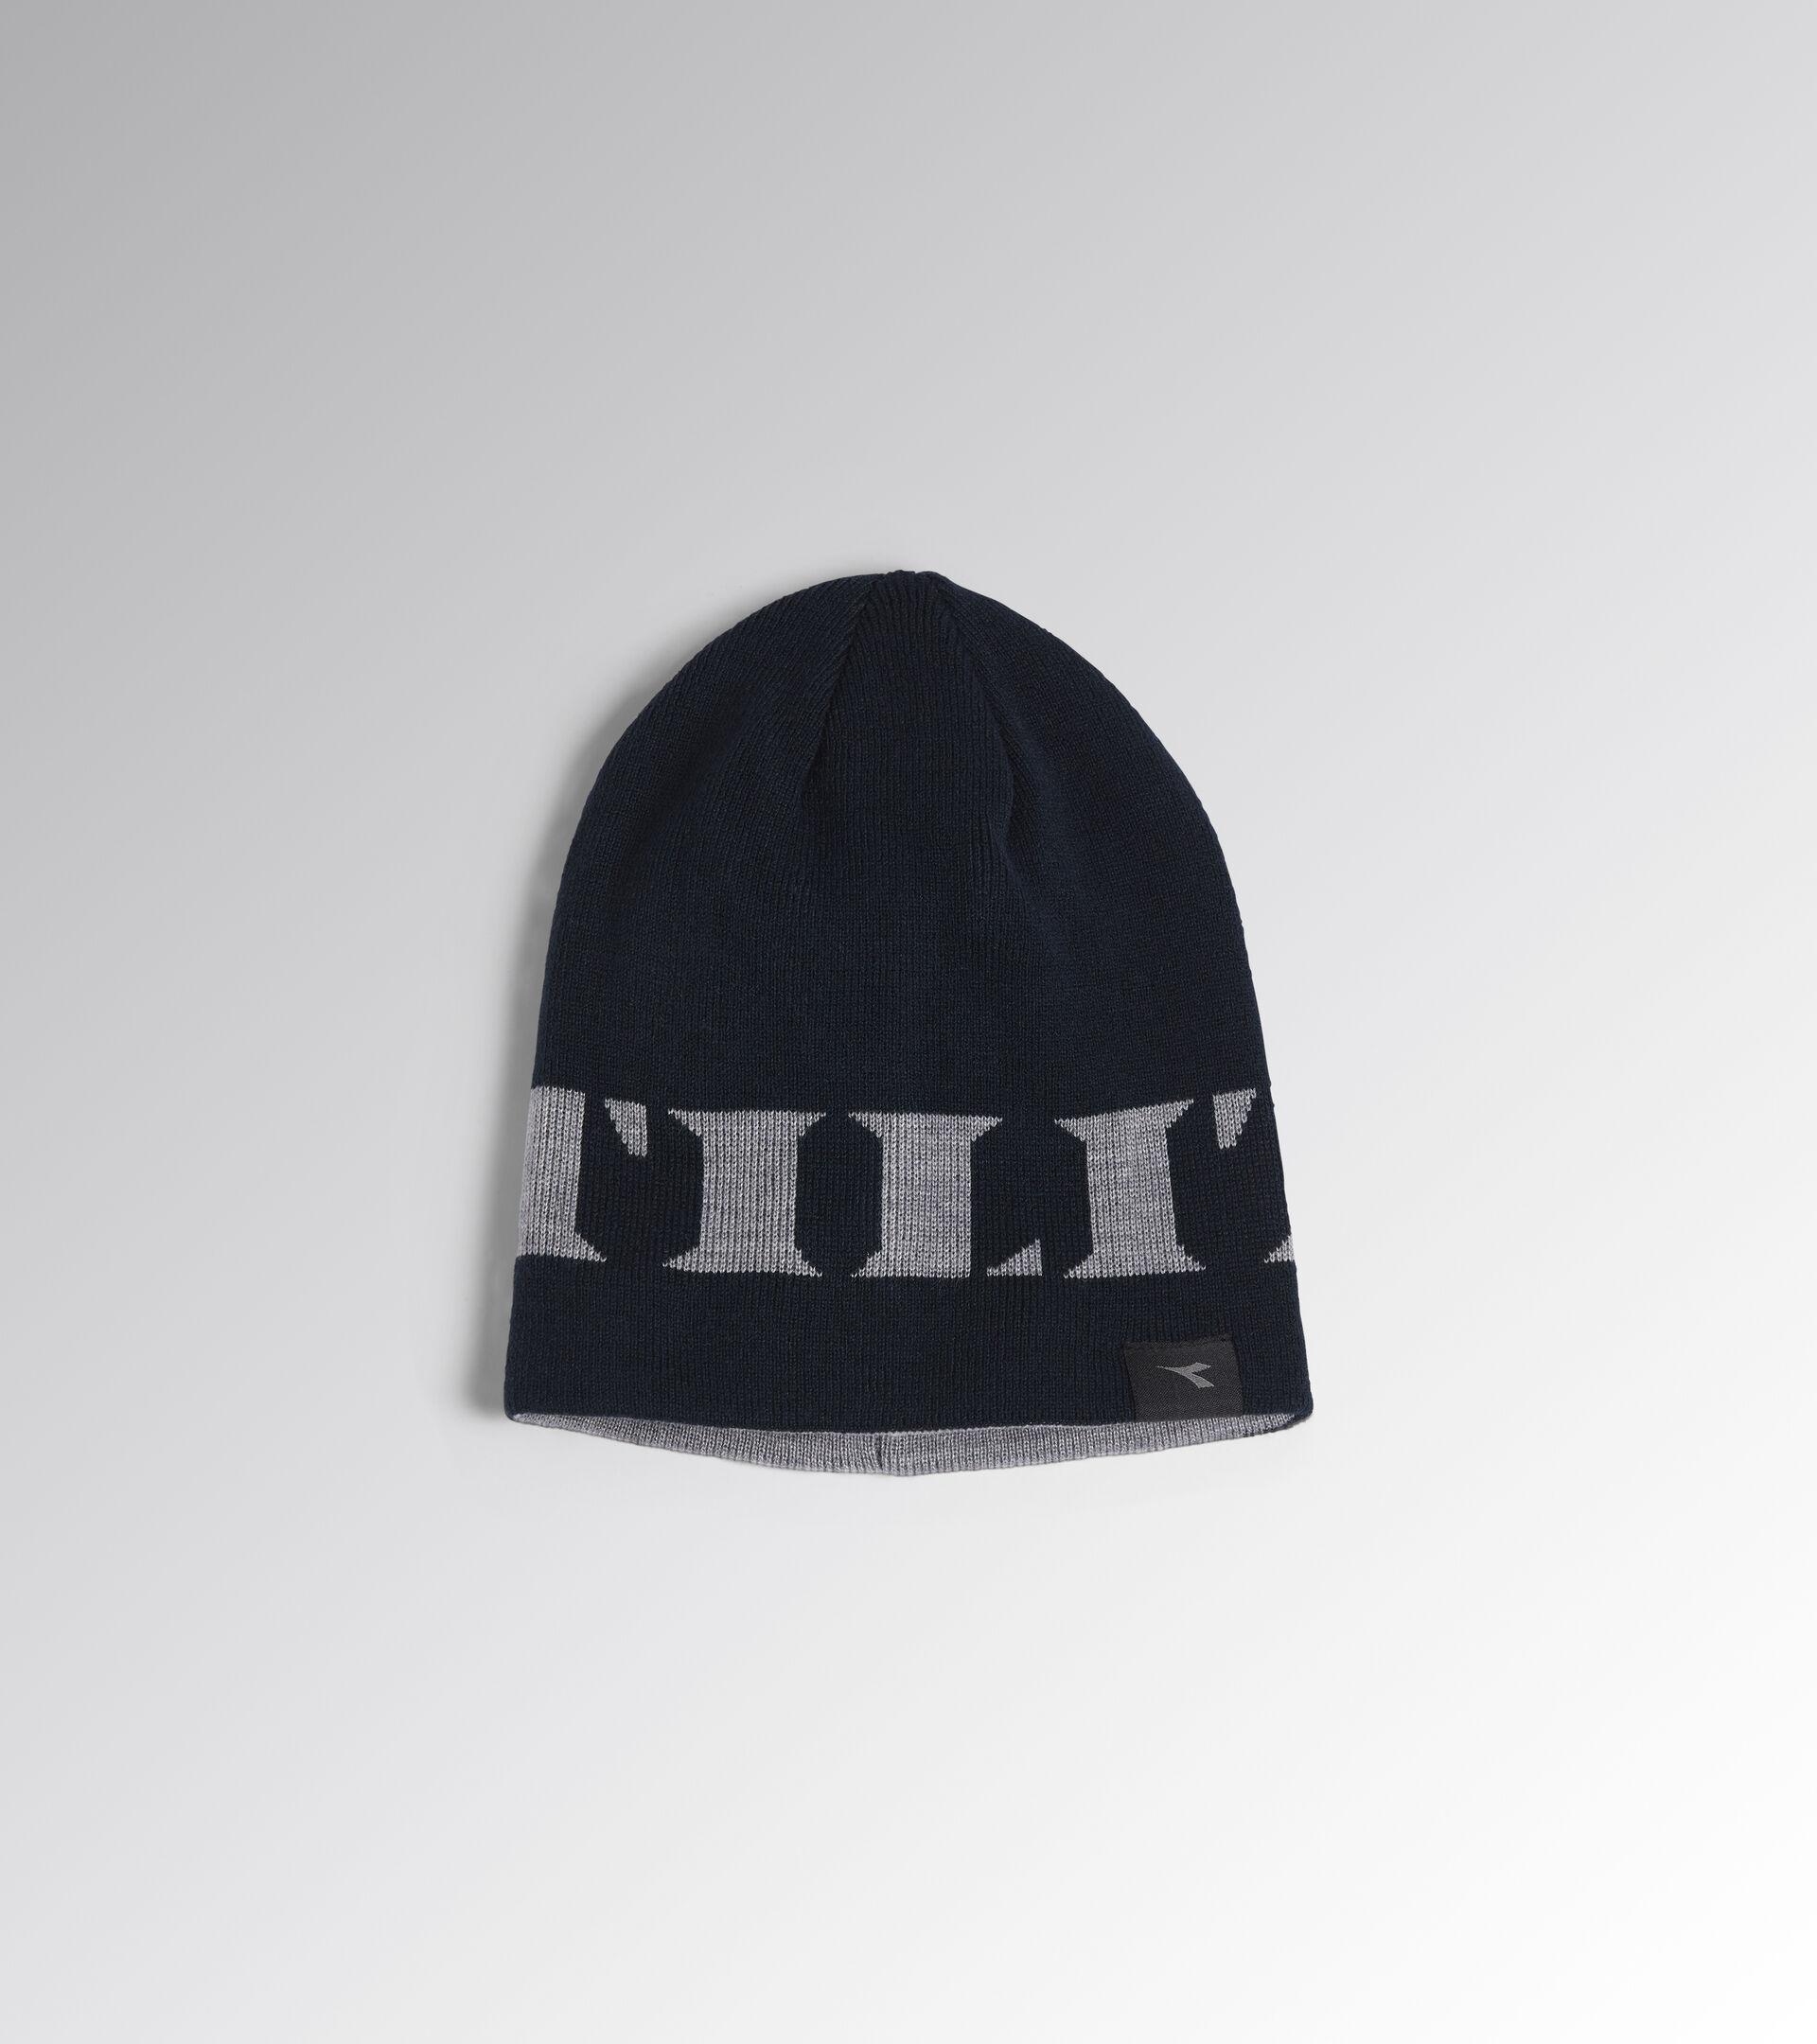 Accessories Utility UNISEX WOOL CAP GRAPHIC BLUE CORSAIR Utility